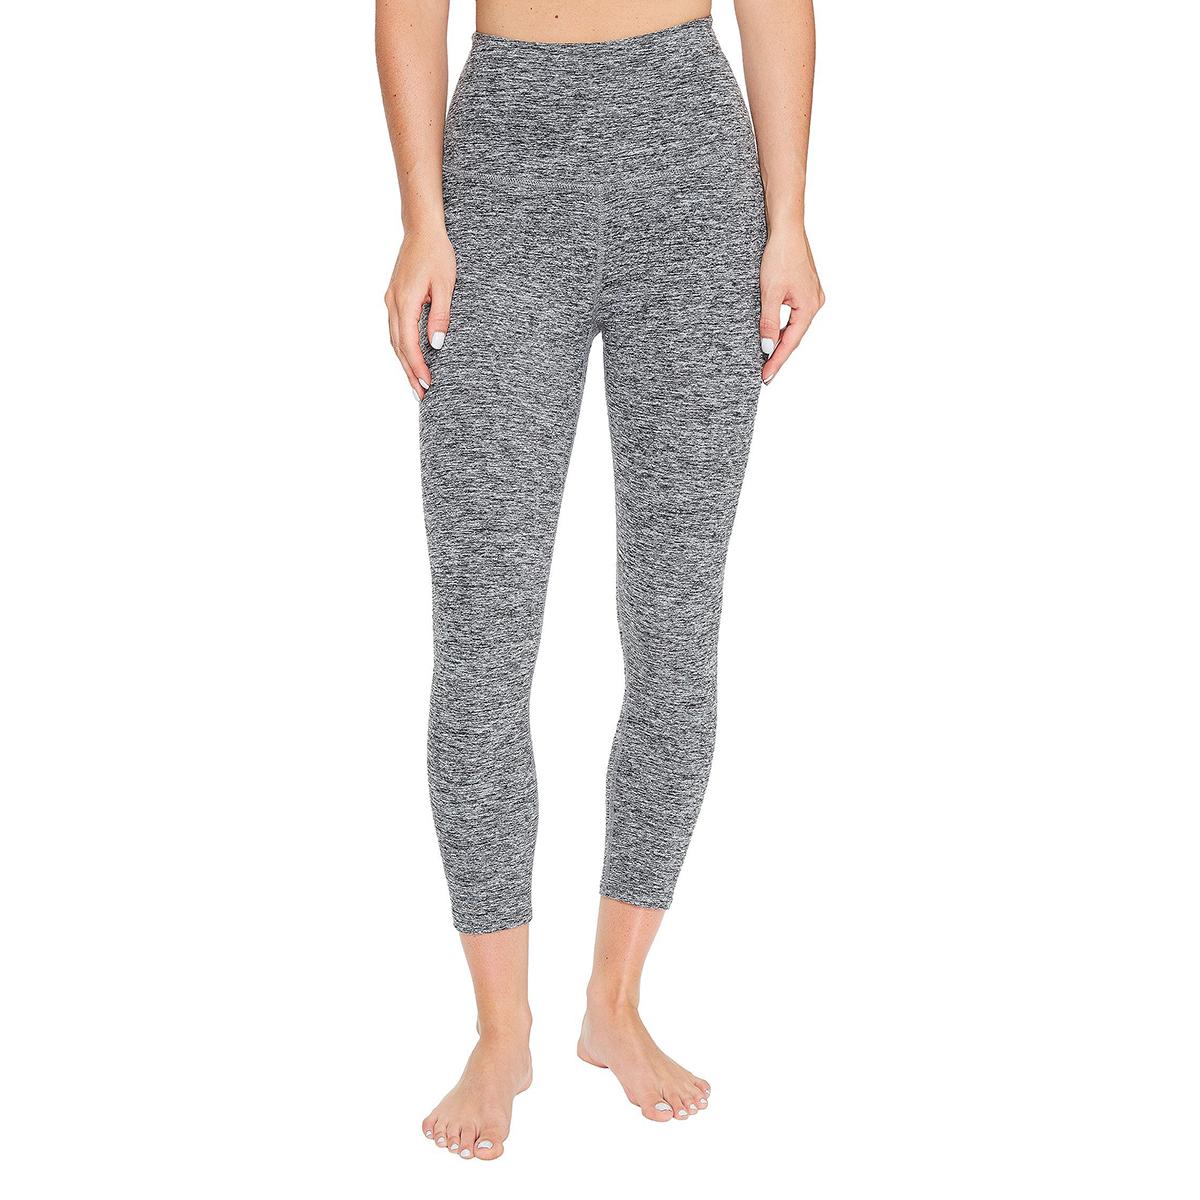 beyond-yoga-leggings